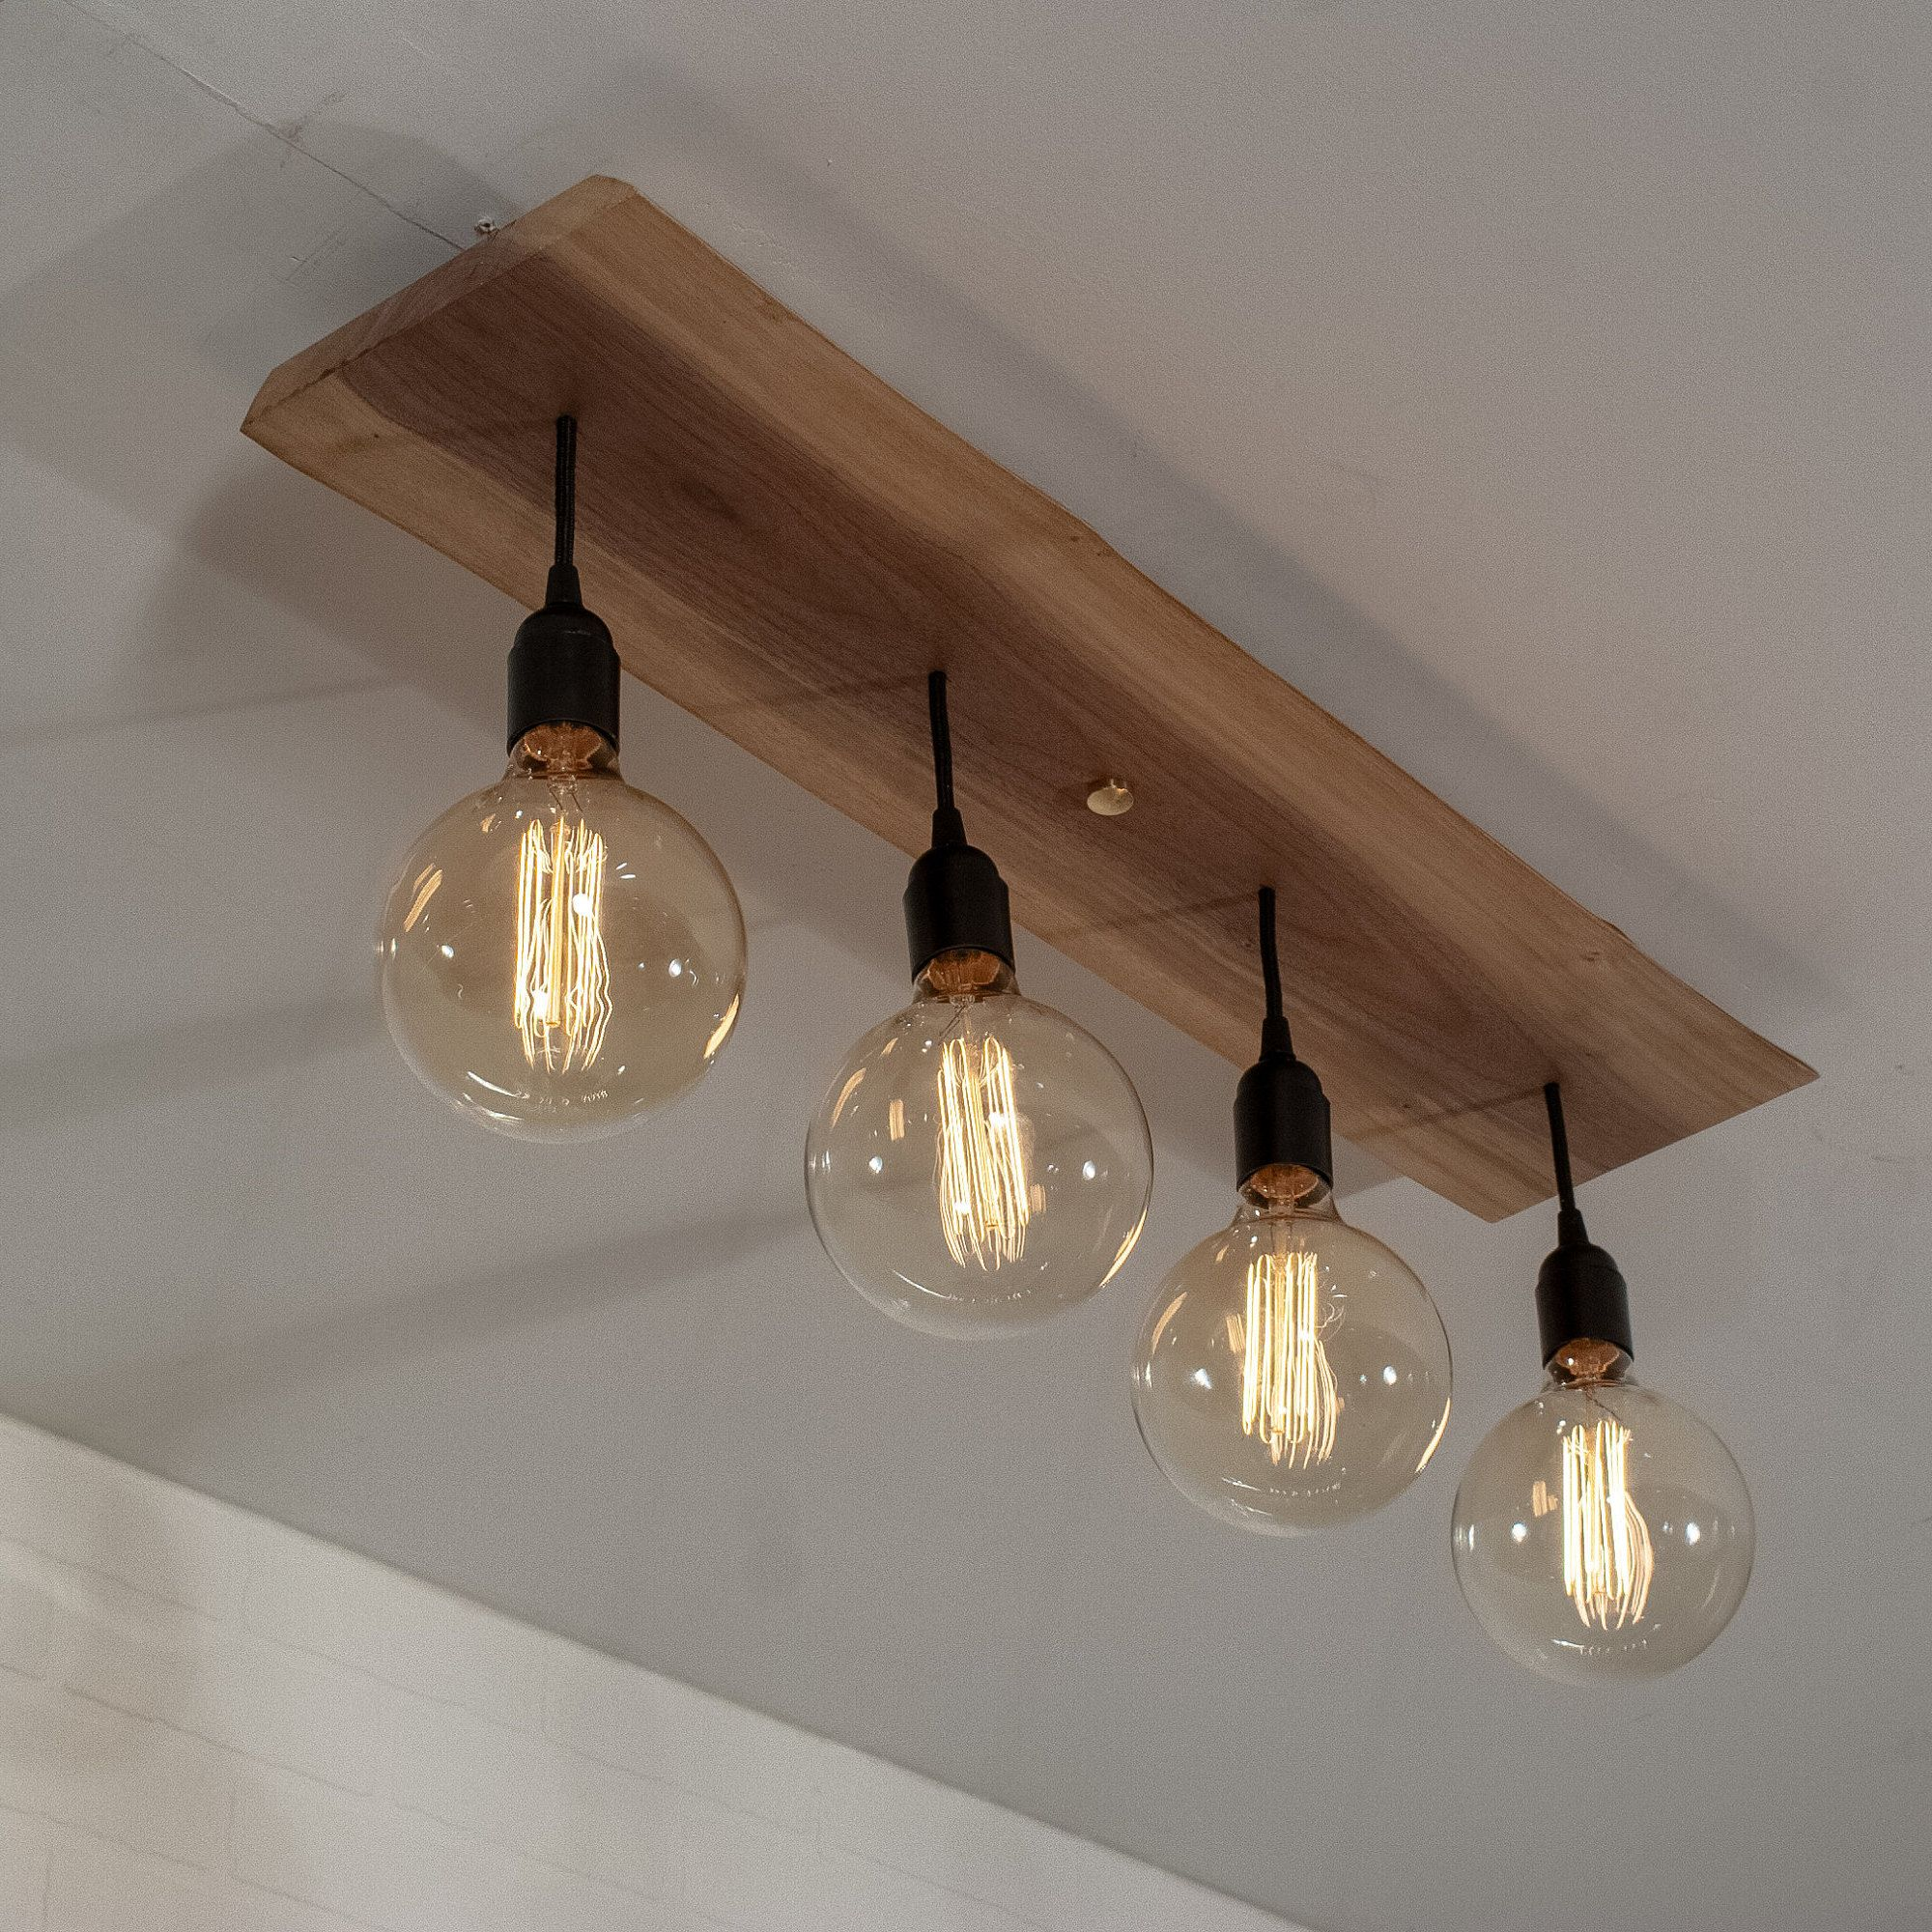 Modern Kitchen Island Lighting Fixture With 4 Short Edison Bulb